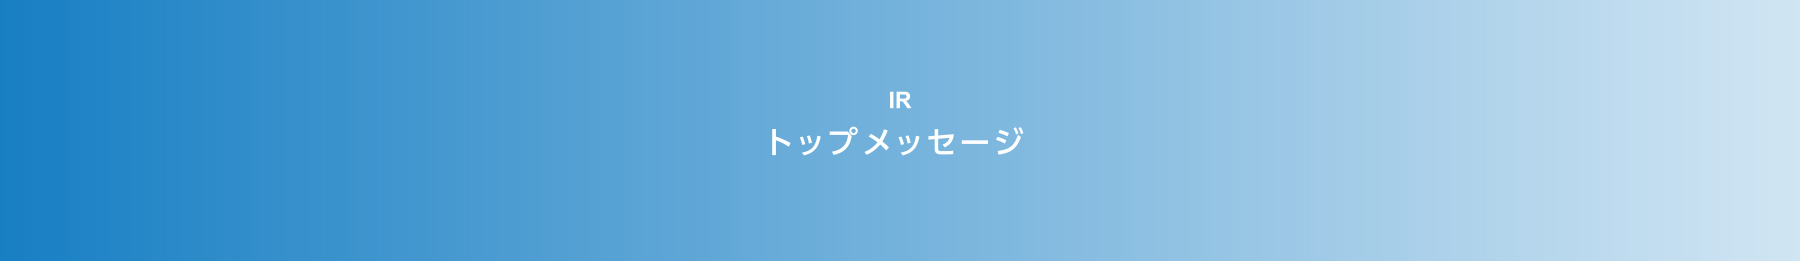 IR トップメッセージ